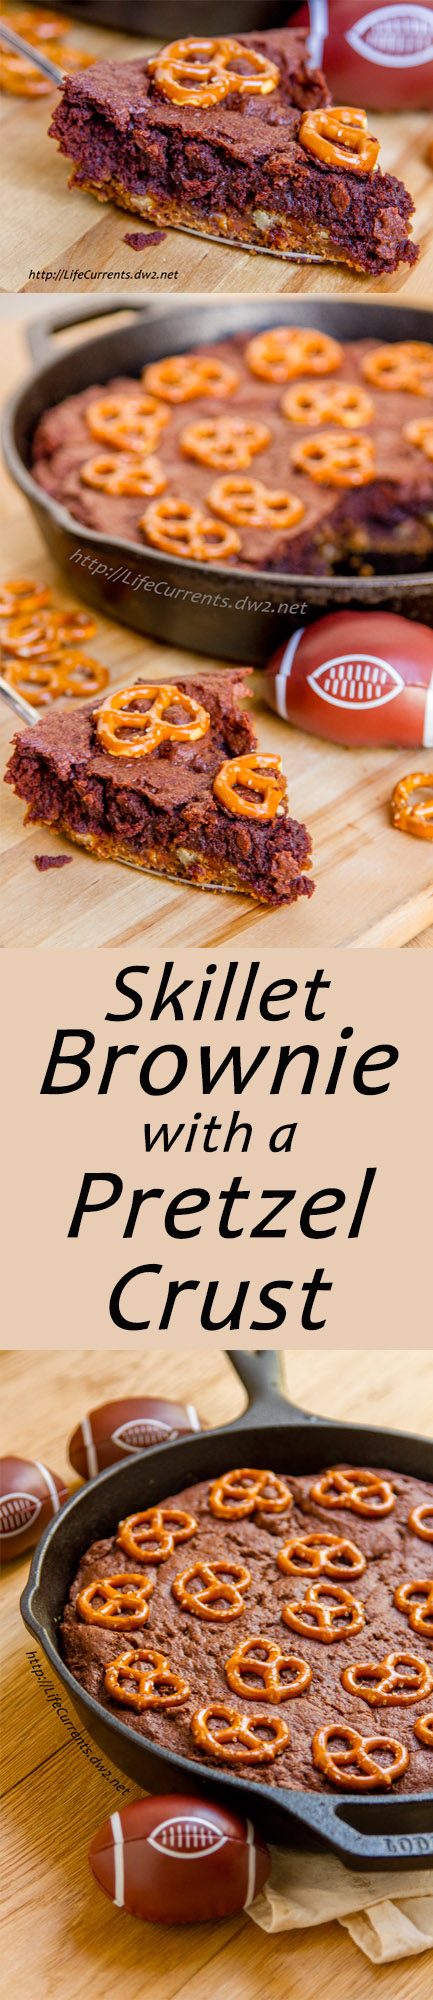 Skillet Brownies with Pretzel Crust